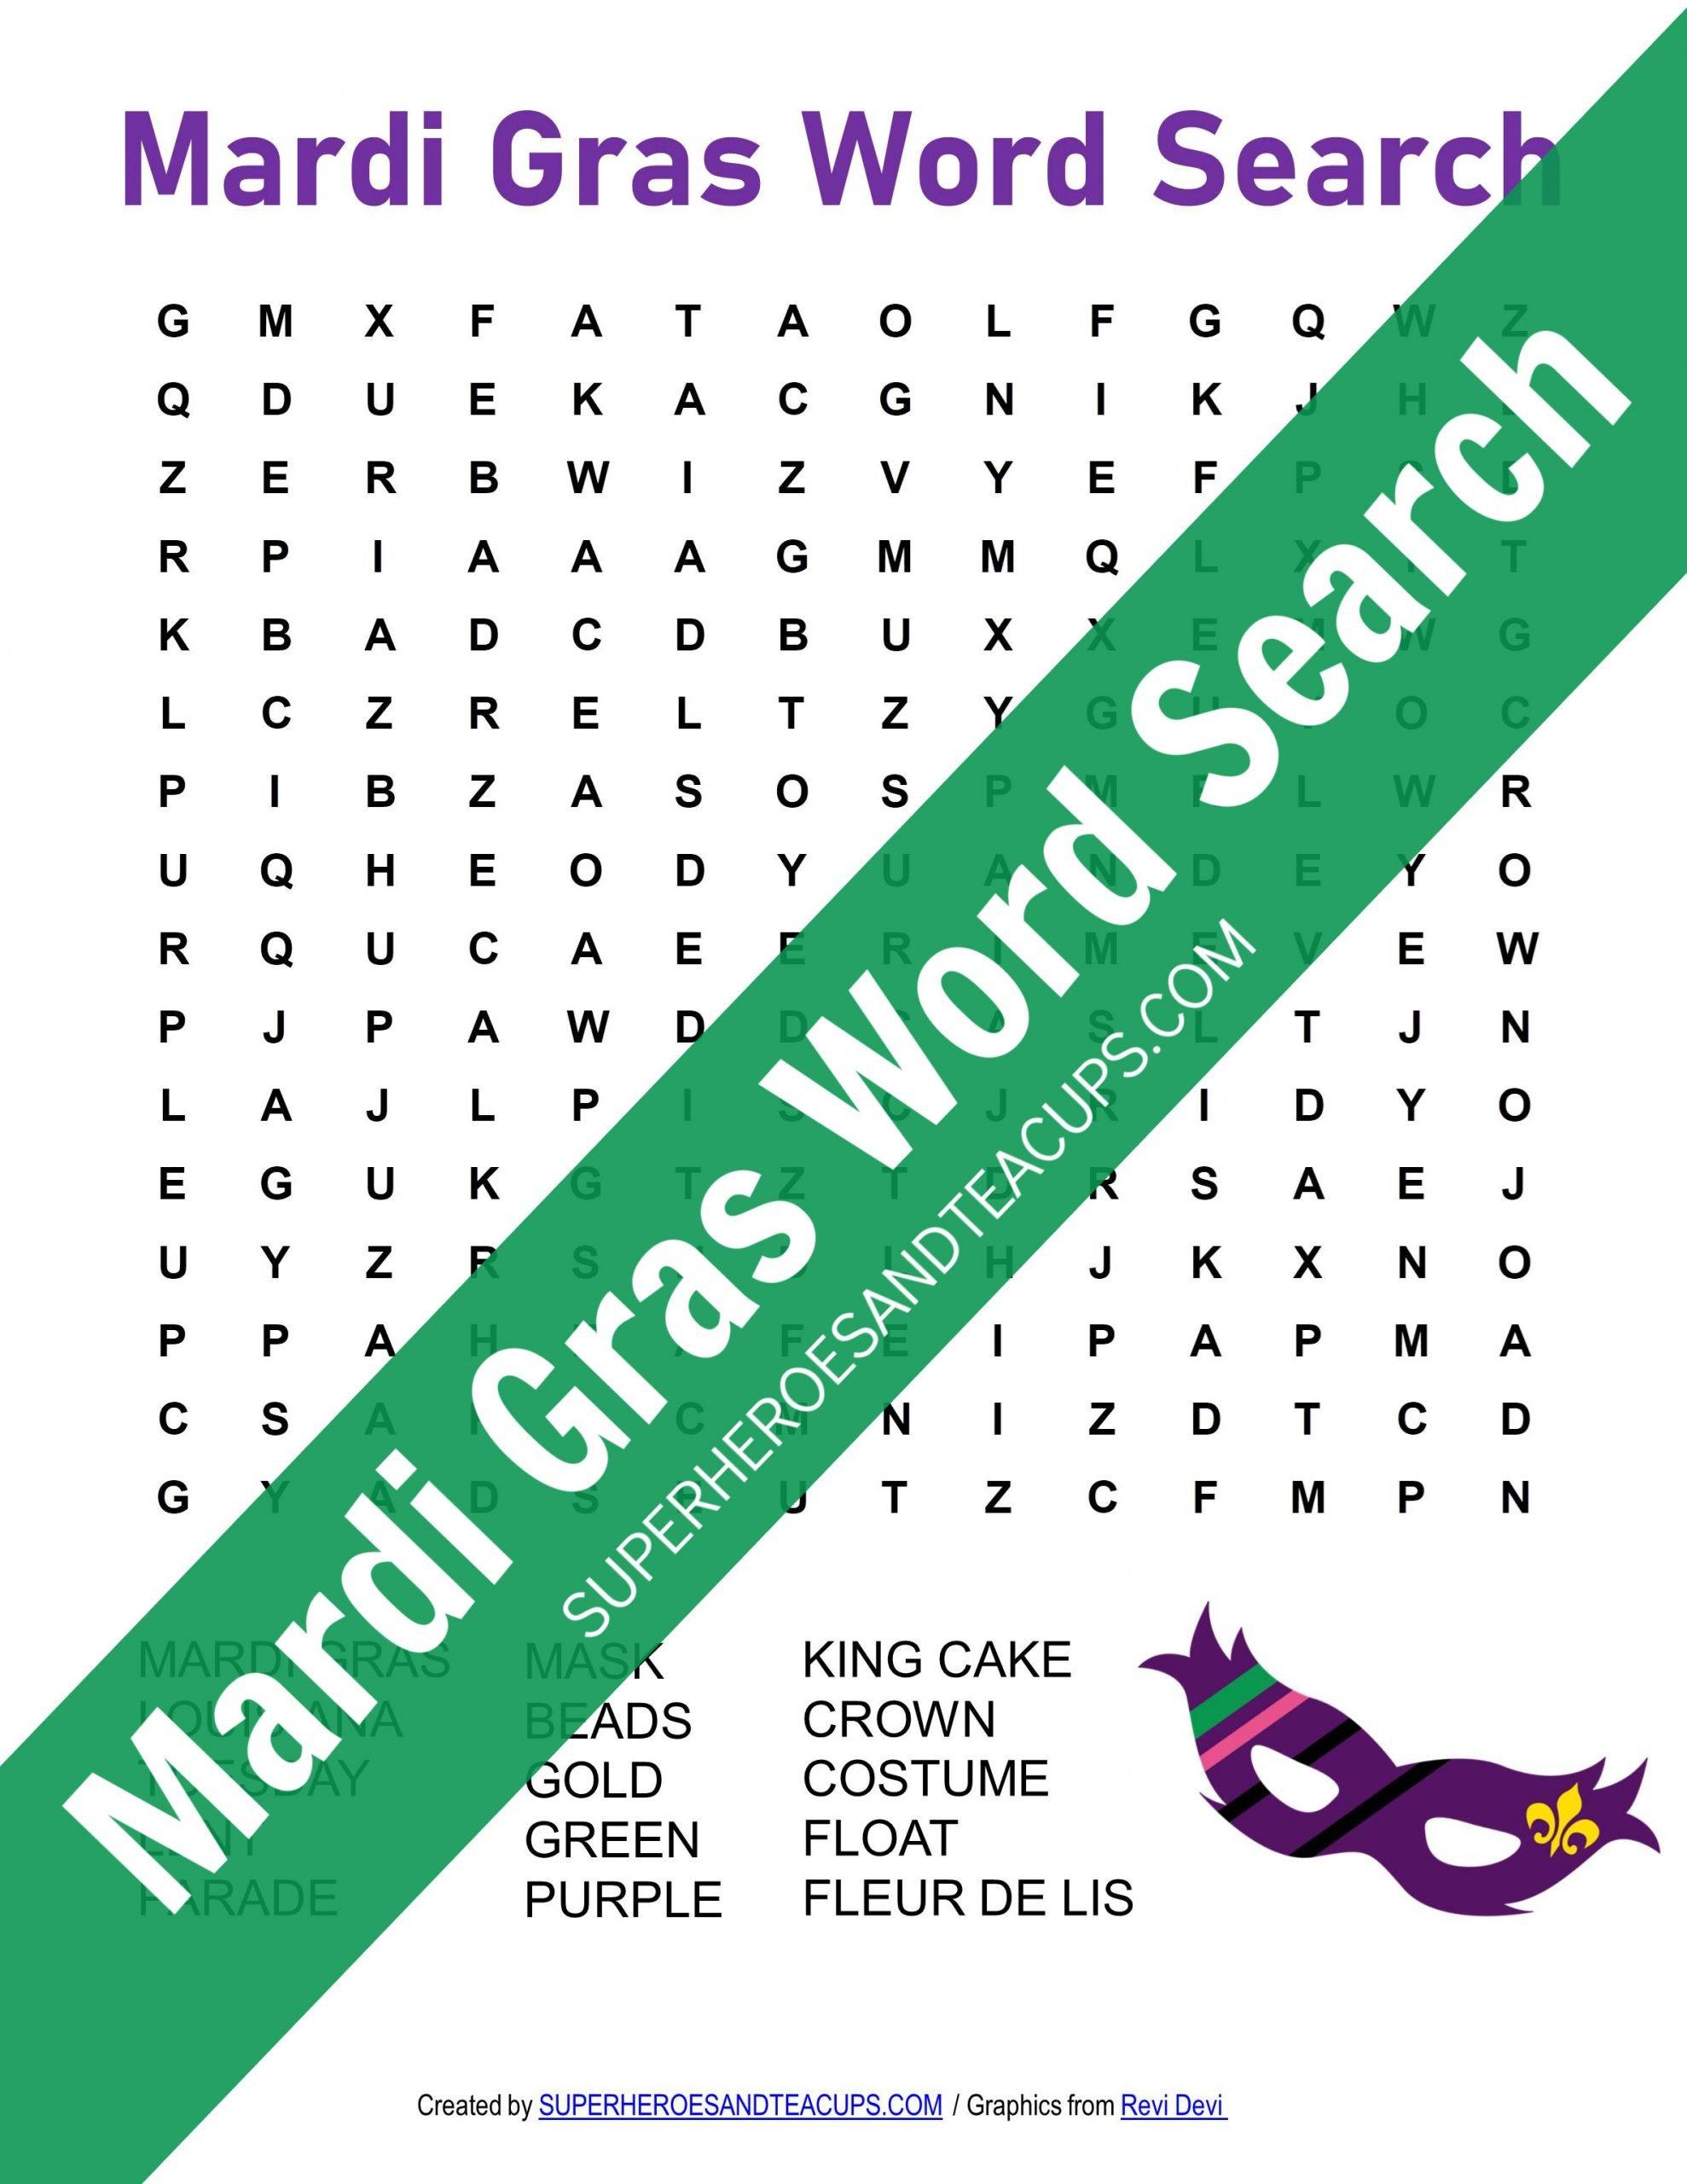 Mardi Gras Word Search Free Printable | Superheroes And Teacups